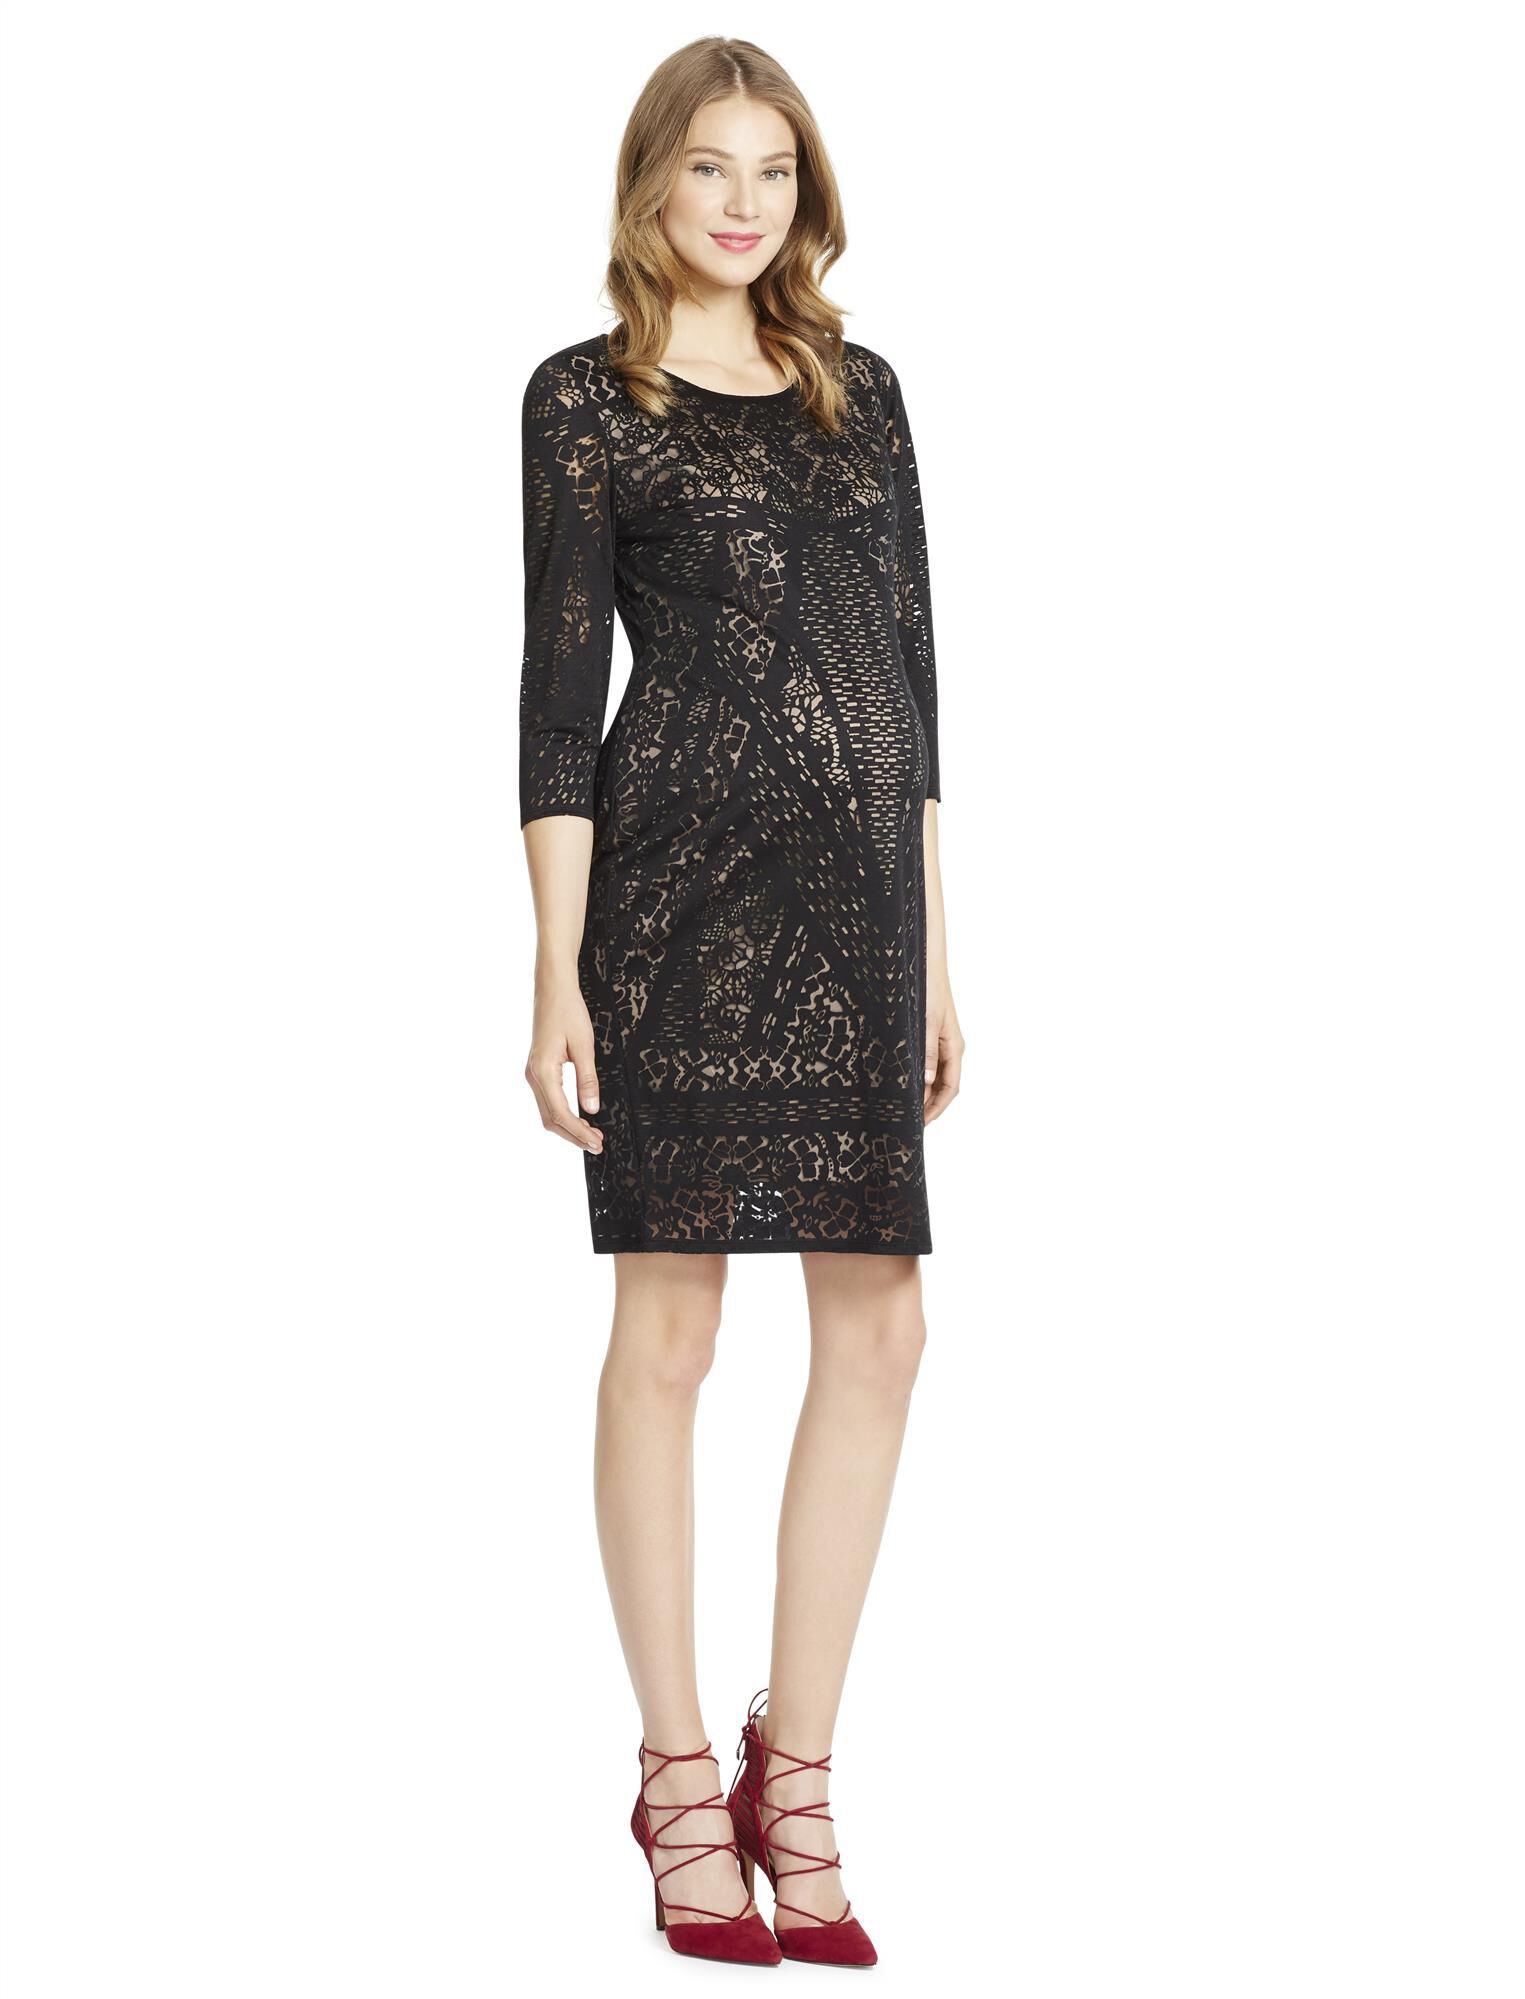 -Jessica Simpson Burnout Maternity Dress